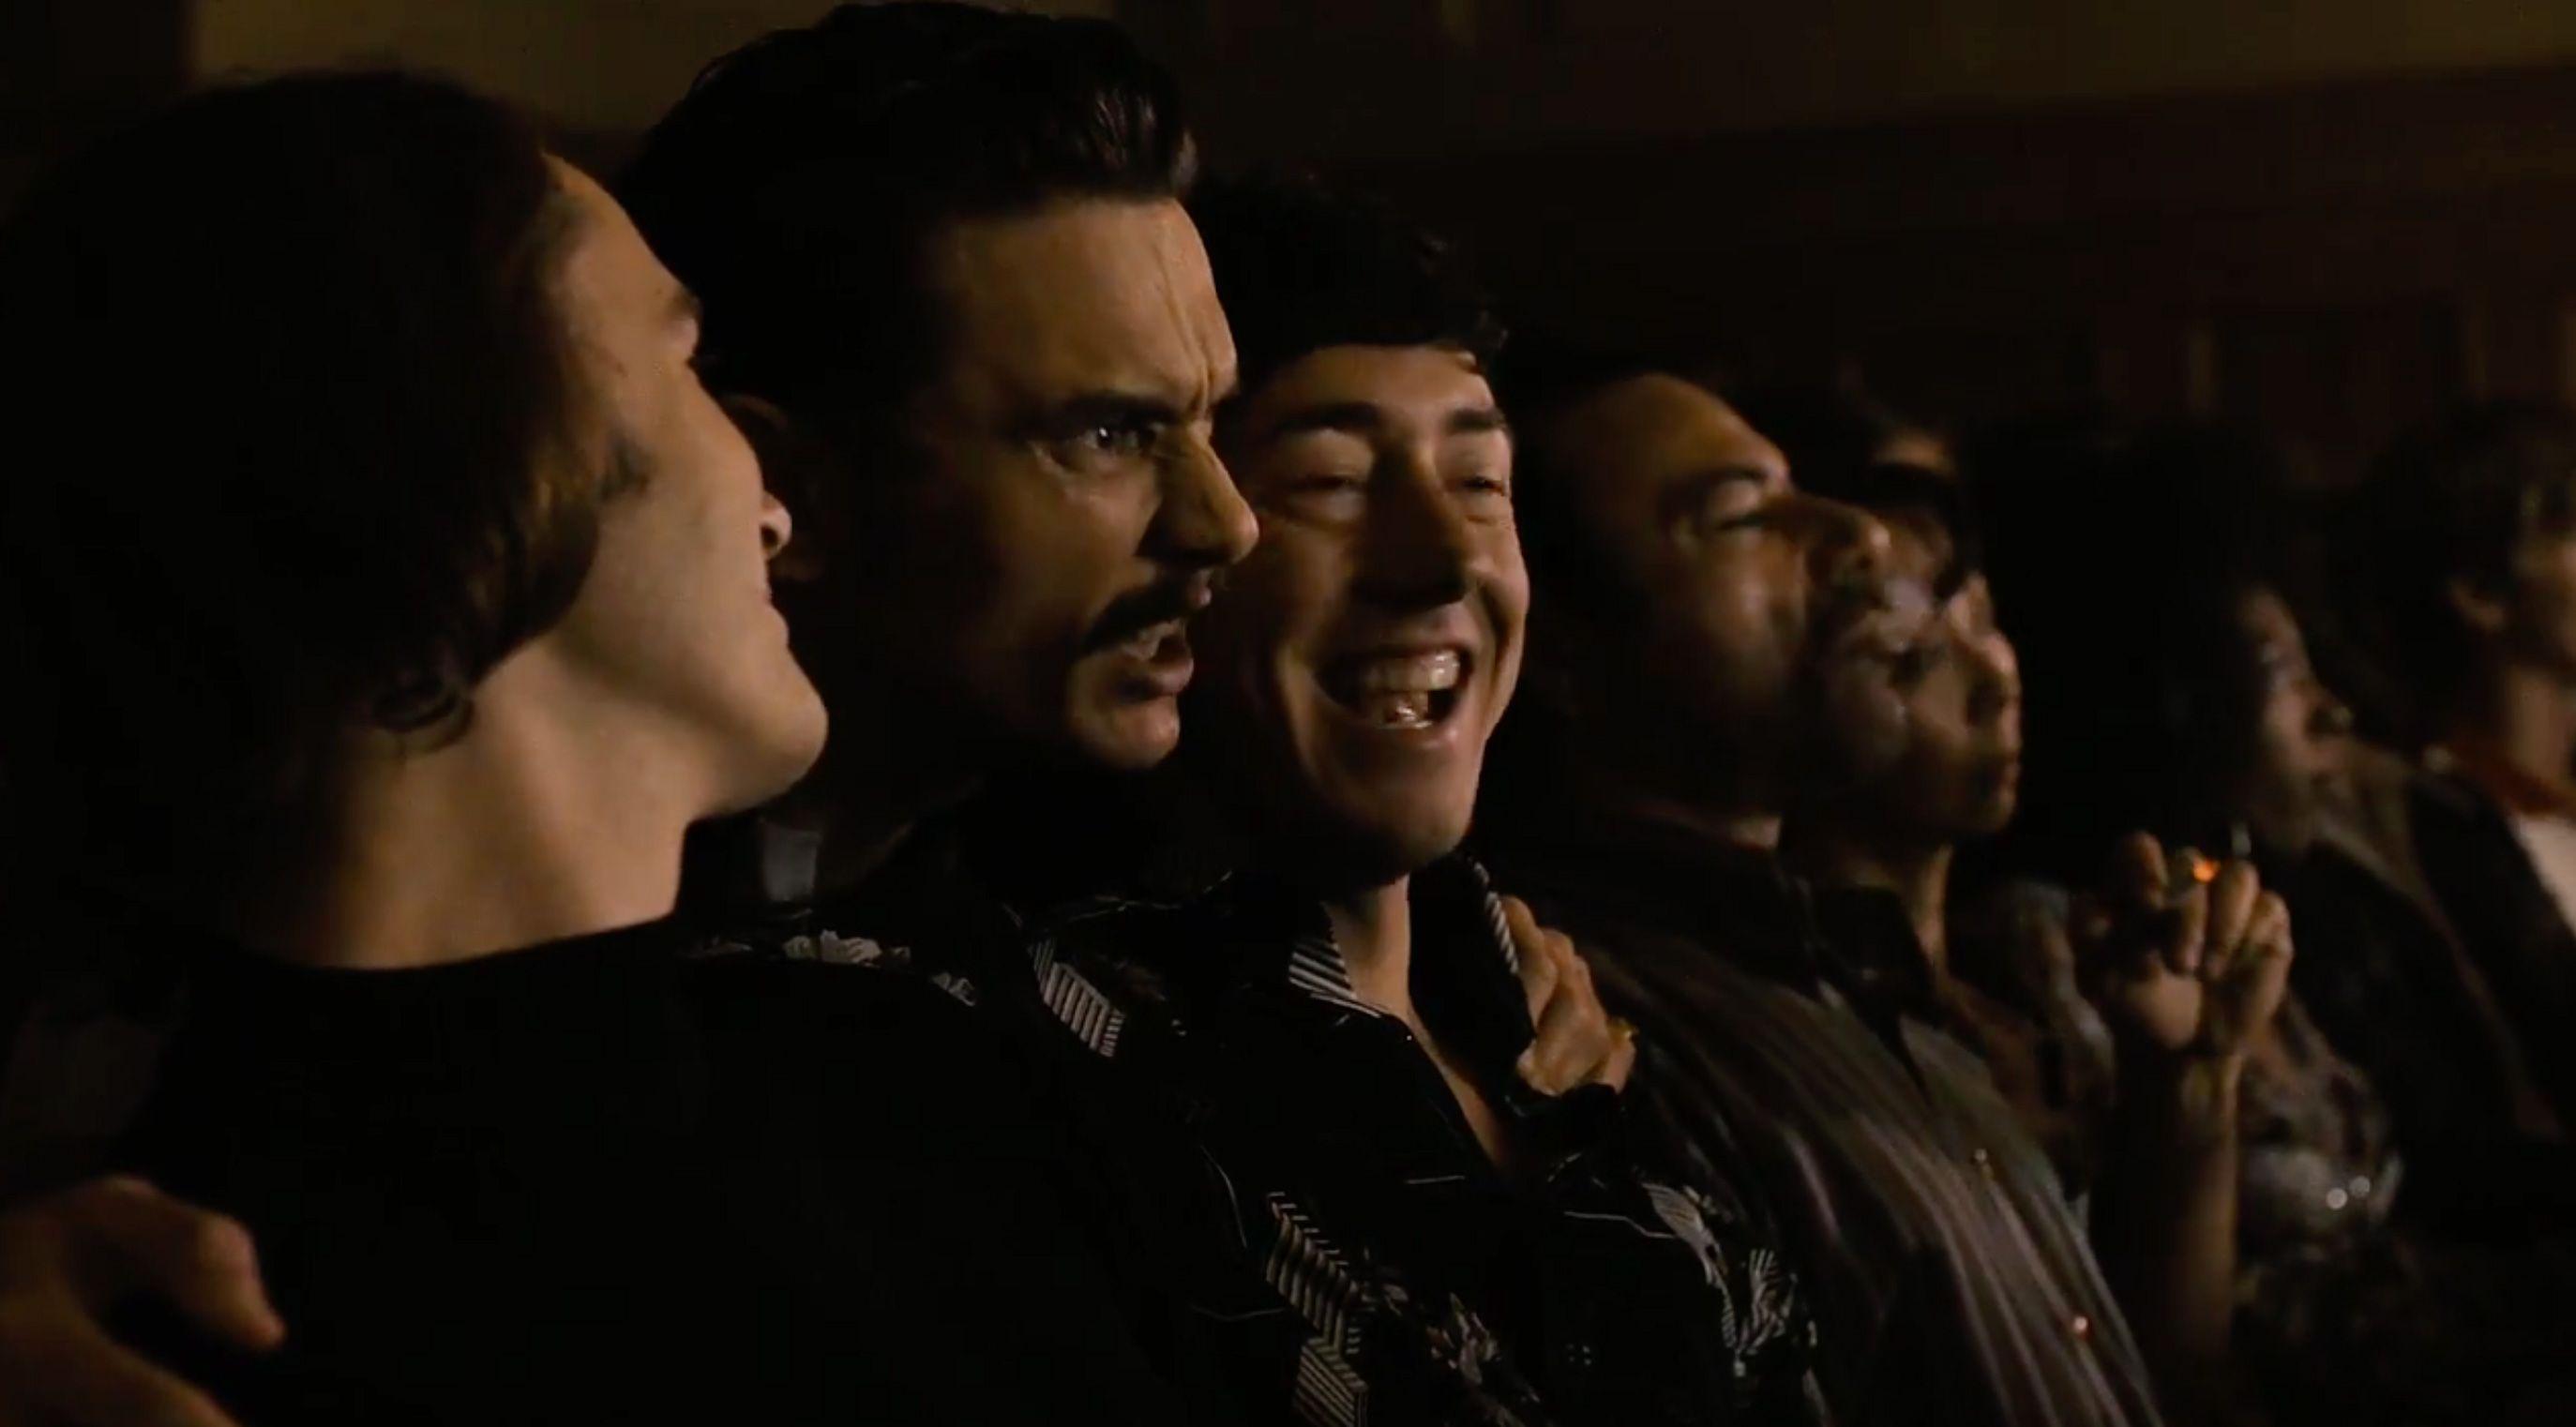 HBO gay sex scener